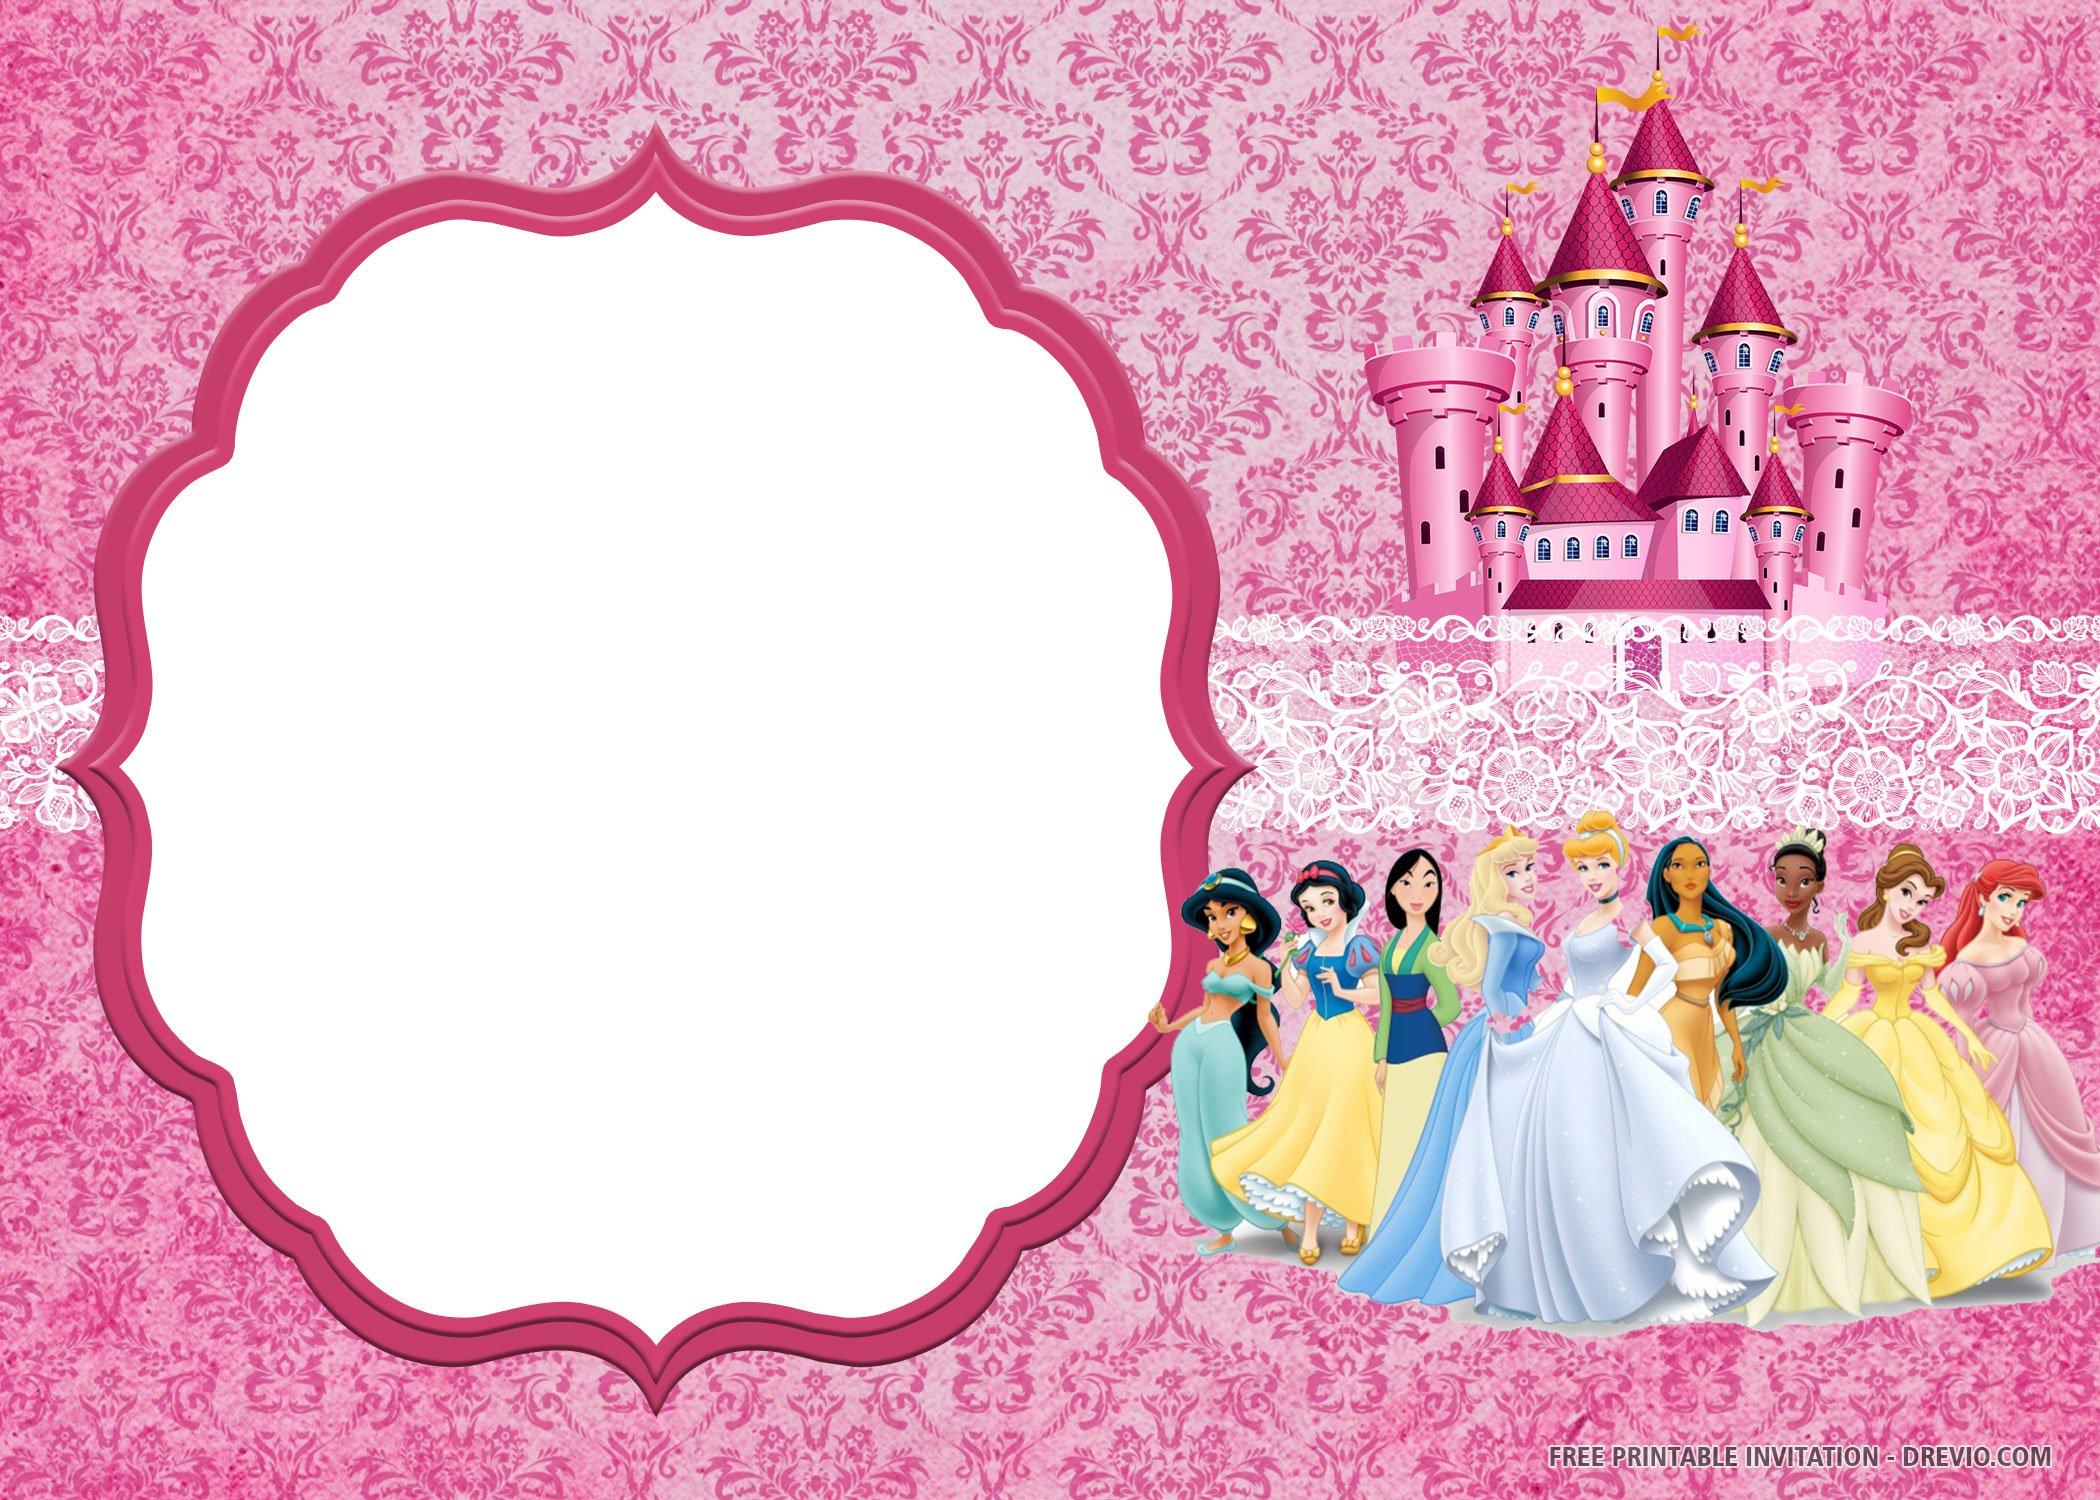 Free Printable Disney Princess Invitation Templates Download Hundreds Free Printable Birthday Invitation Templates